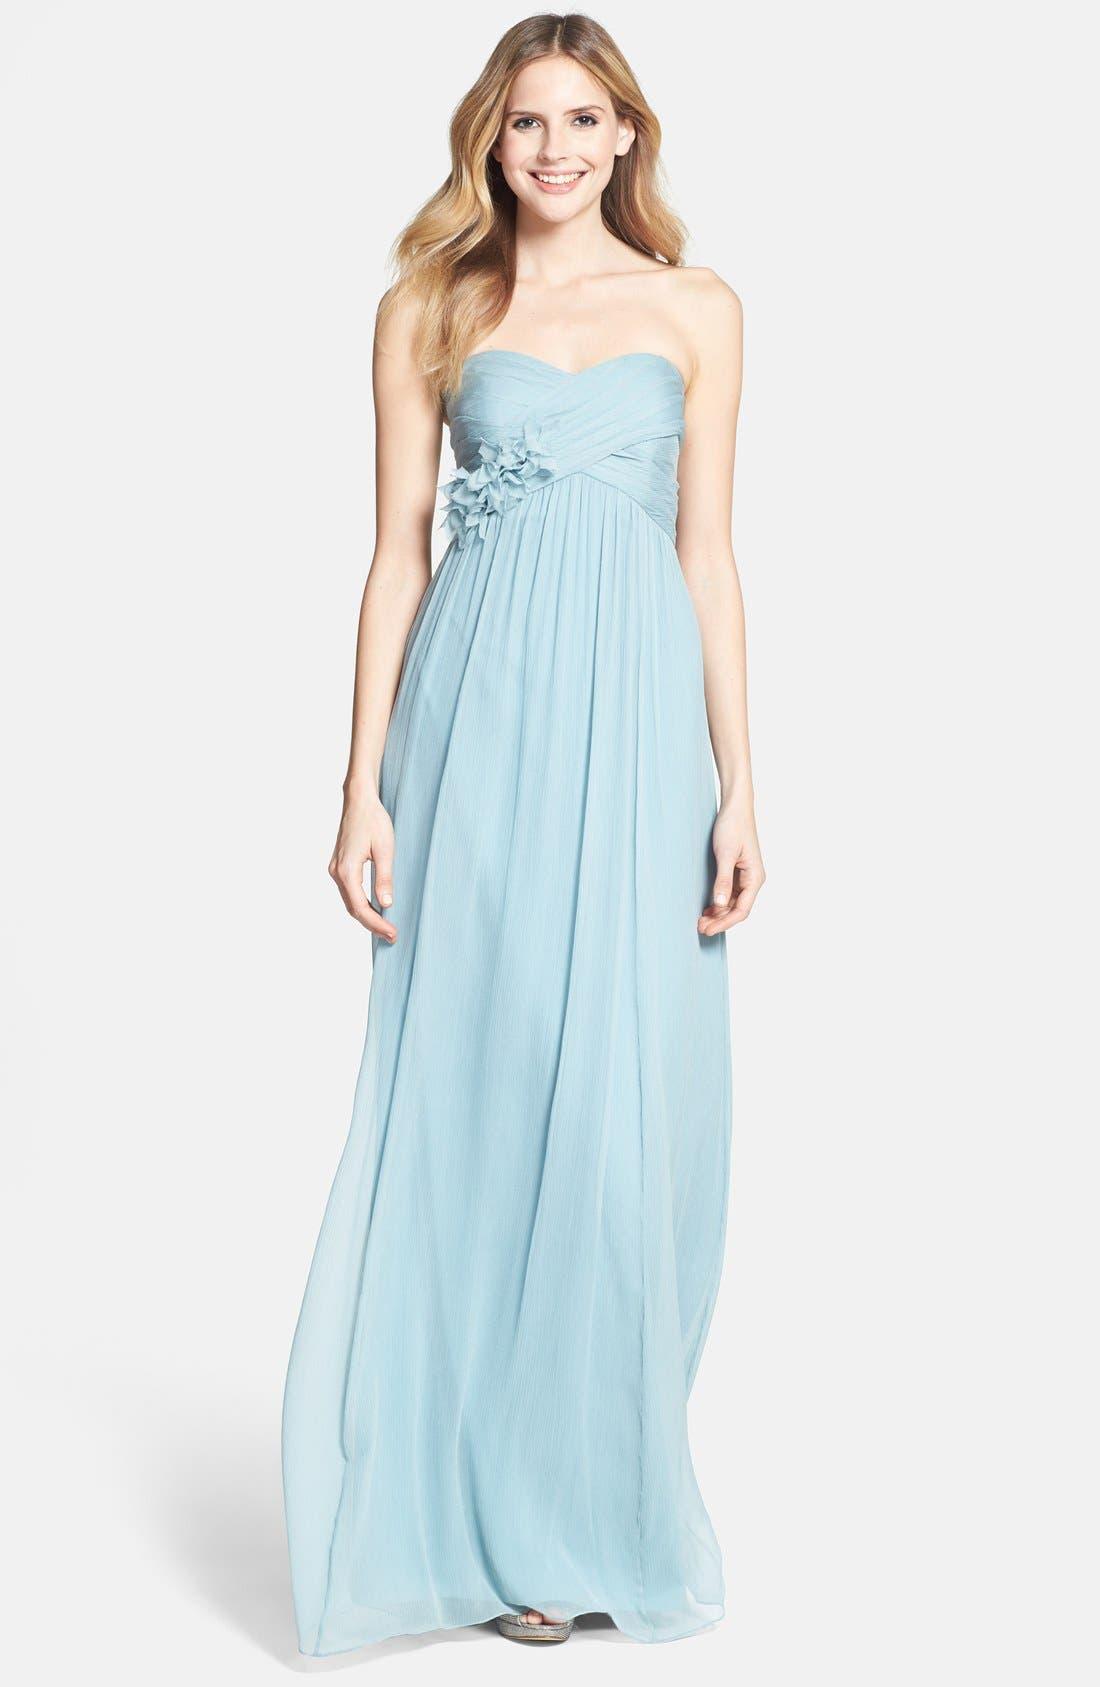 Main Image - Jenny Yoo 'Sienna' Strapless Crinkle Silk Chiffon Dress